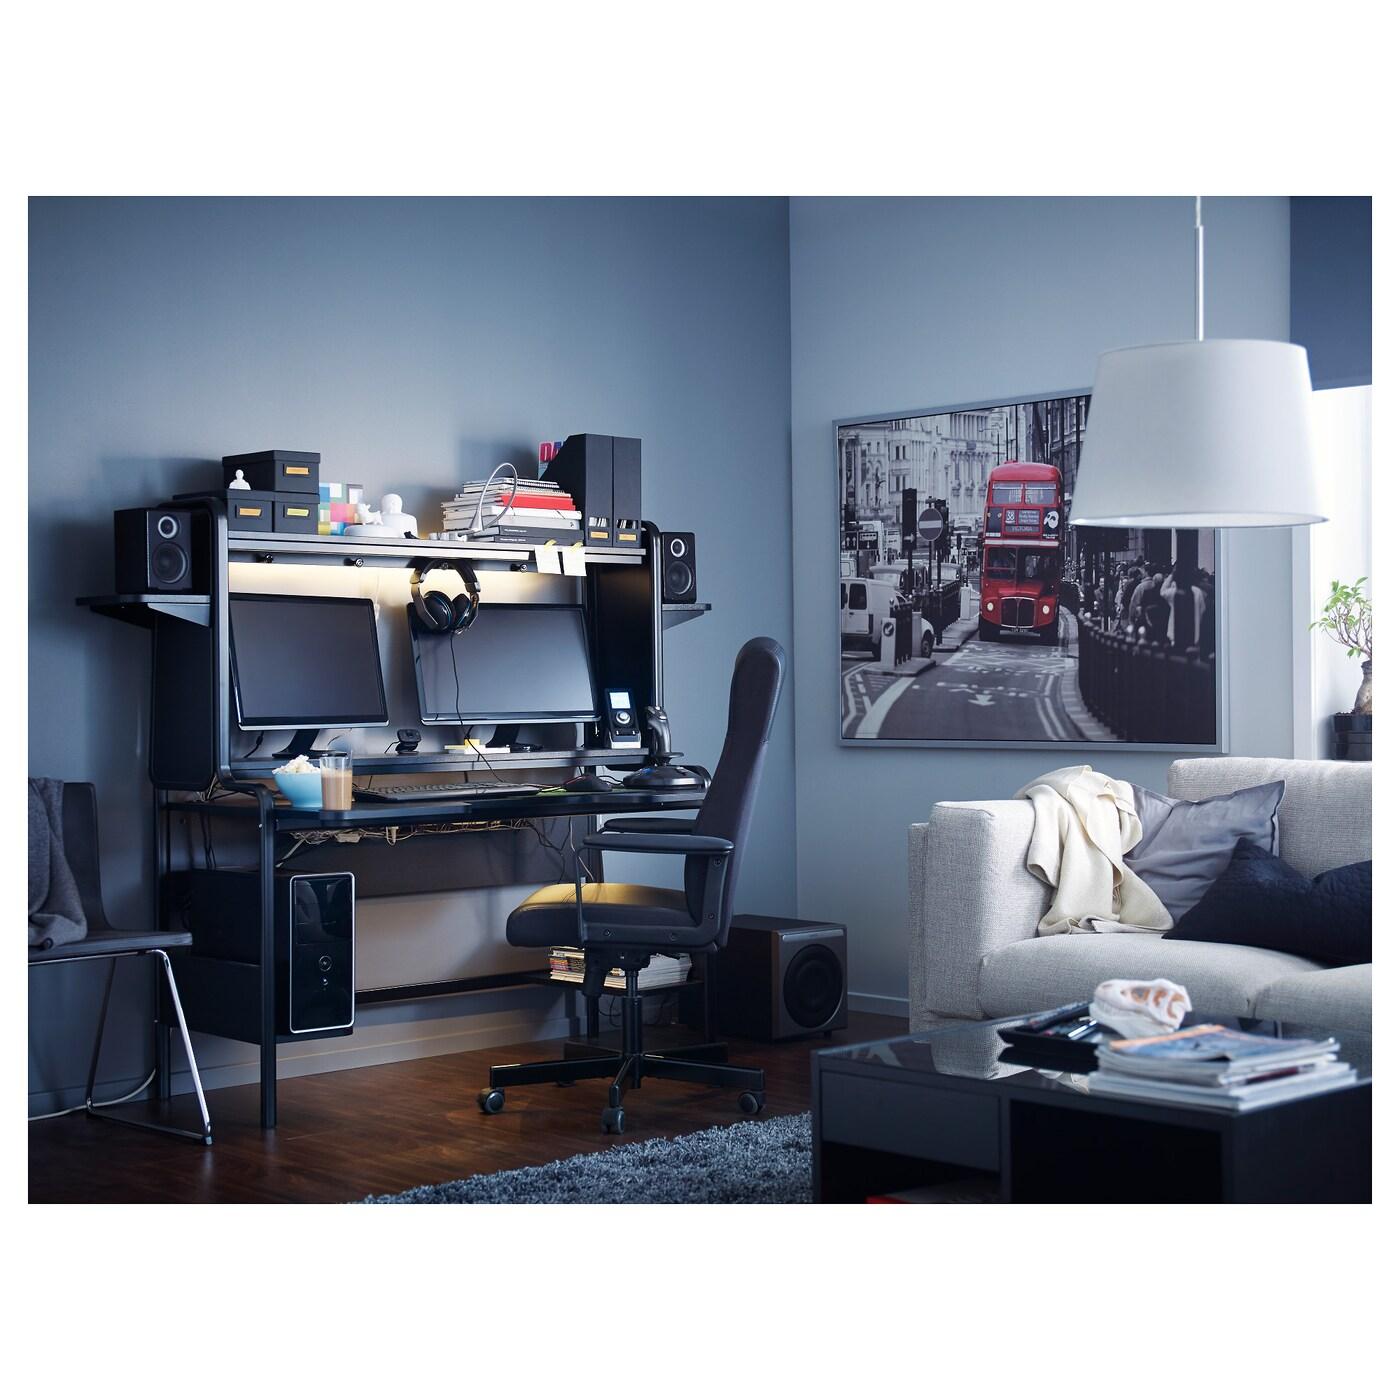 FREDDE Skrivbord, svart, 185x74x146 cm